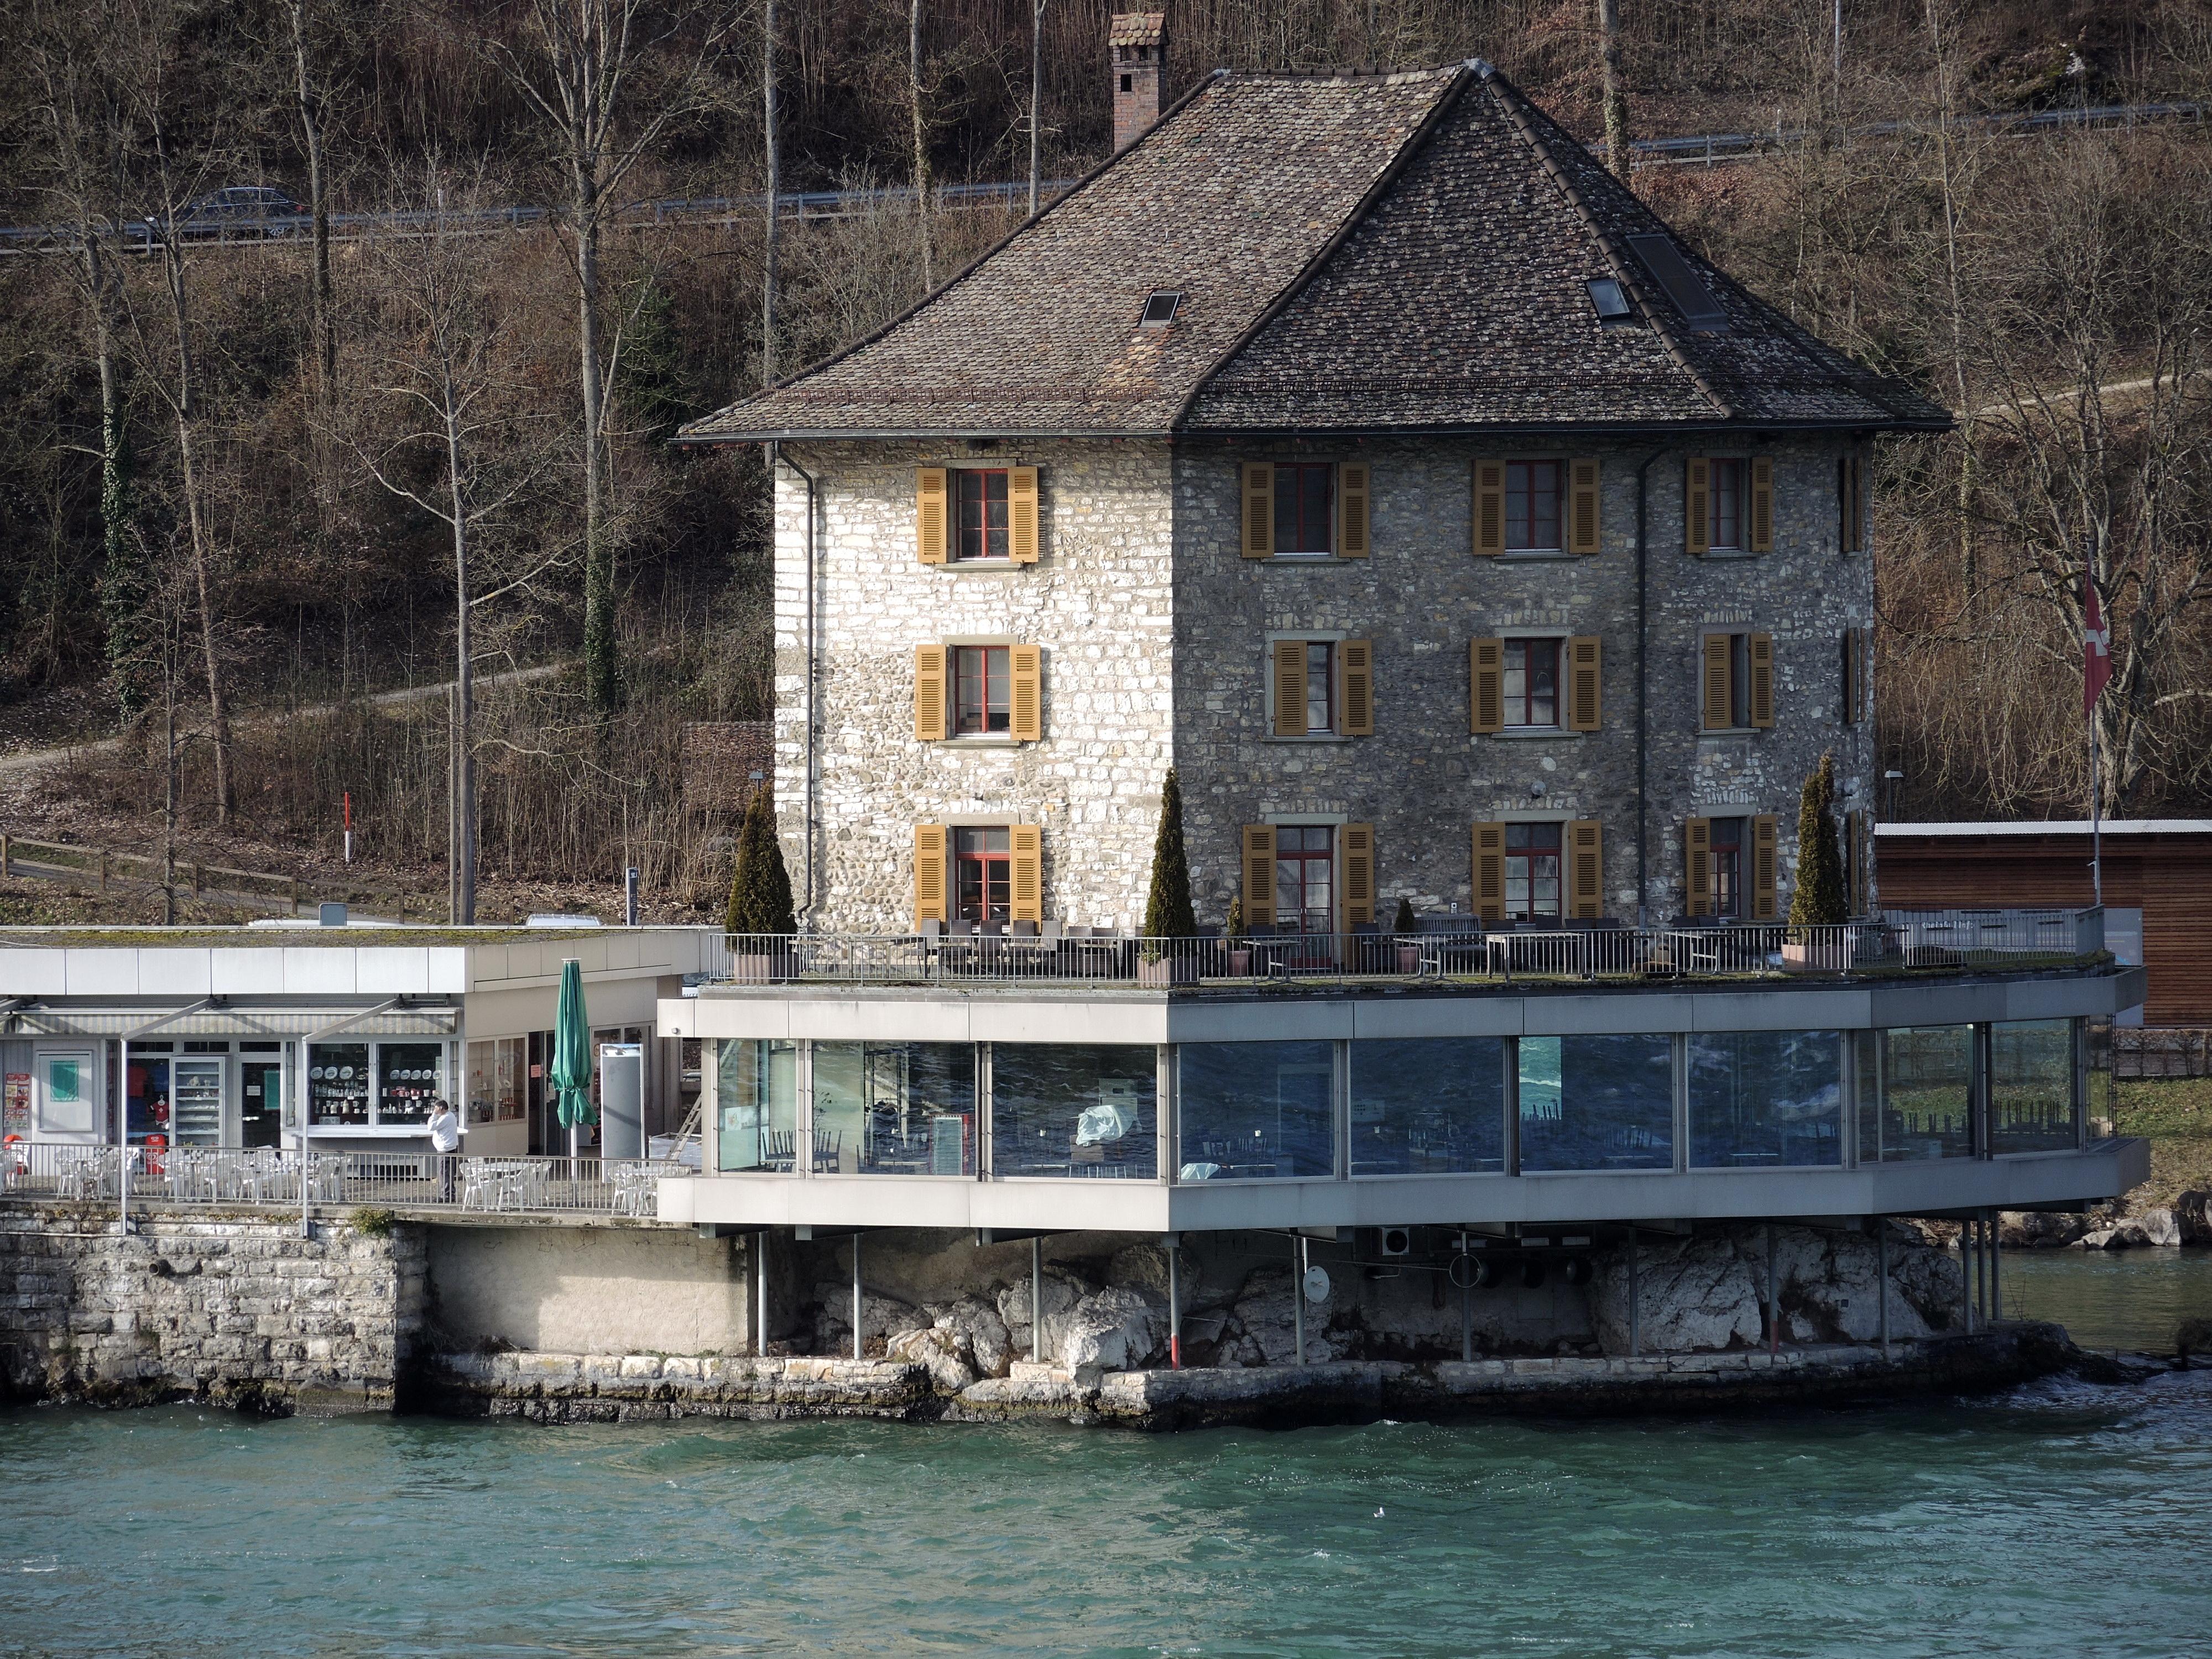 Hotel Schloss Am Meer Ostseebad K Ef Bf Bdhlungsborn